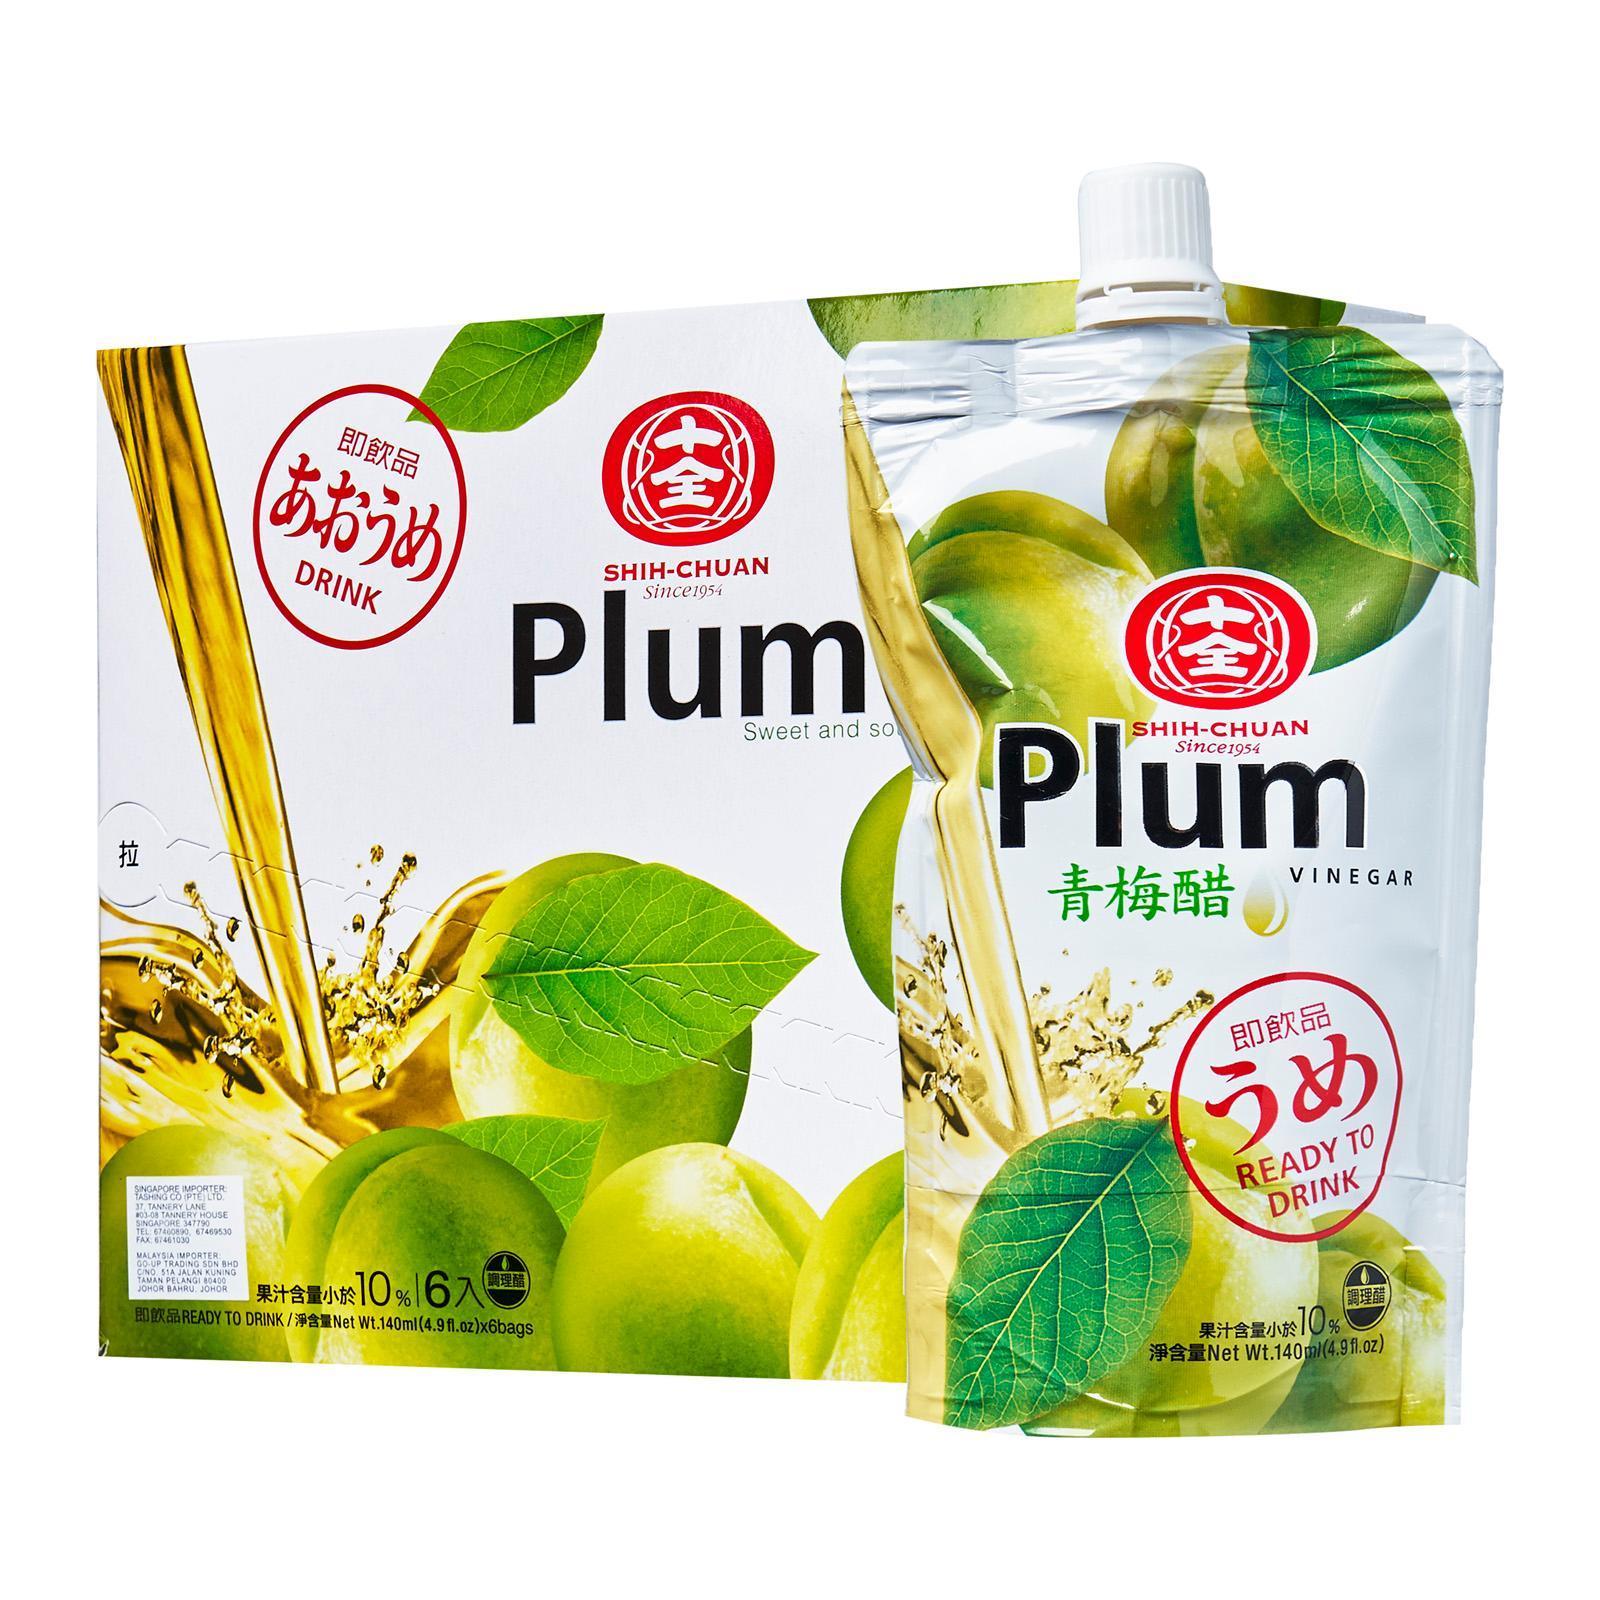 Shih Chuan Plum Vinegar Drink (Pack Of 6)